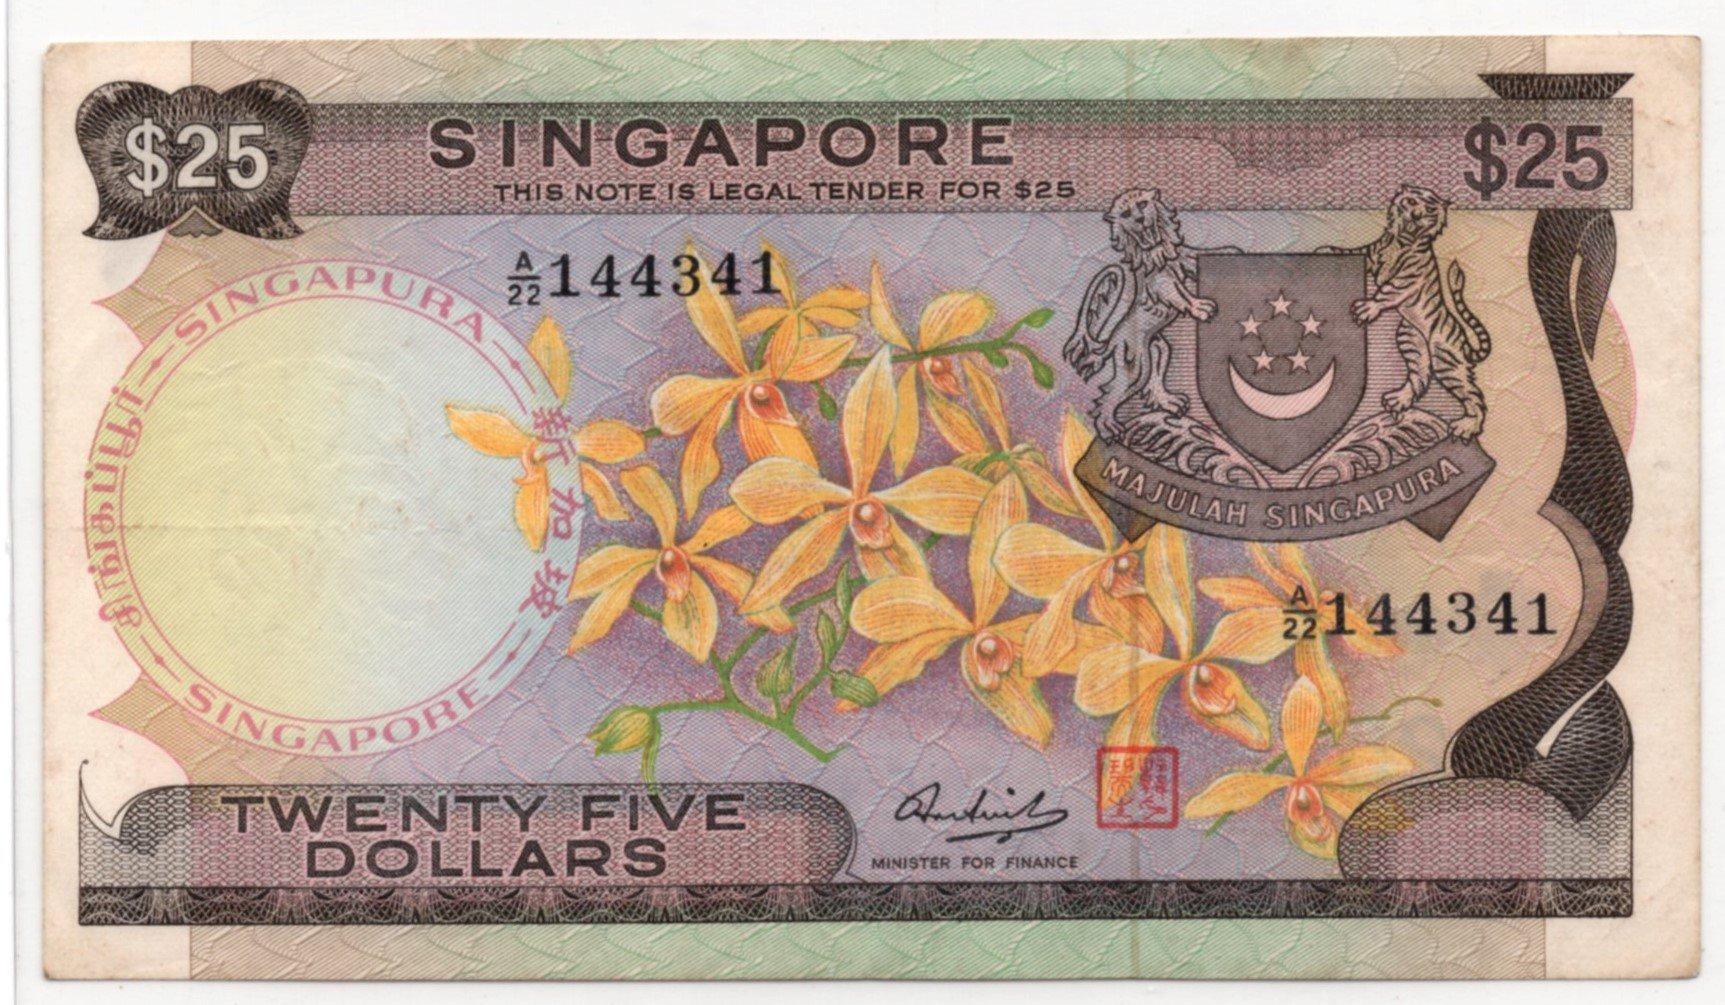 Singapore 25 dollars orchid